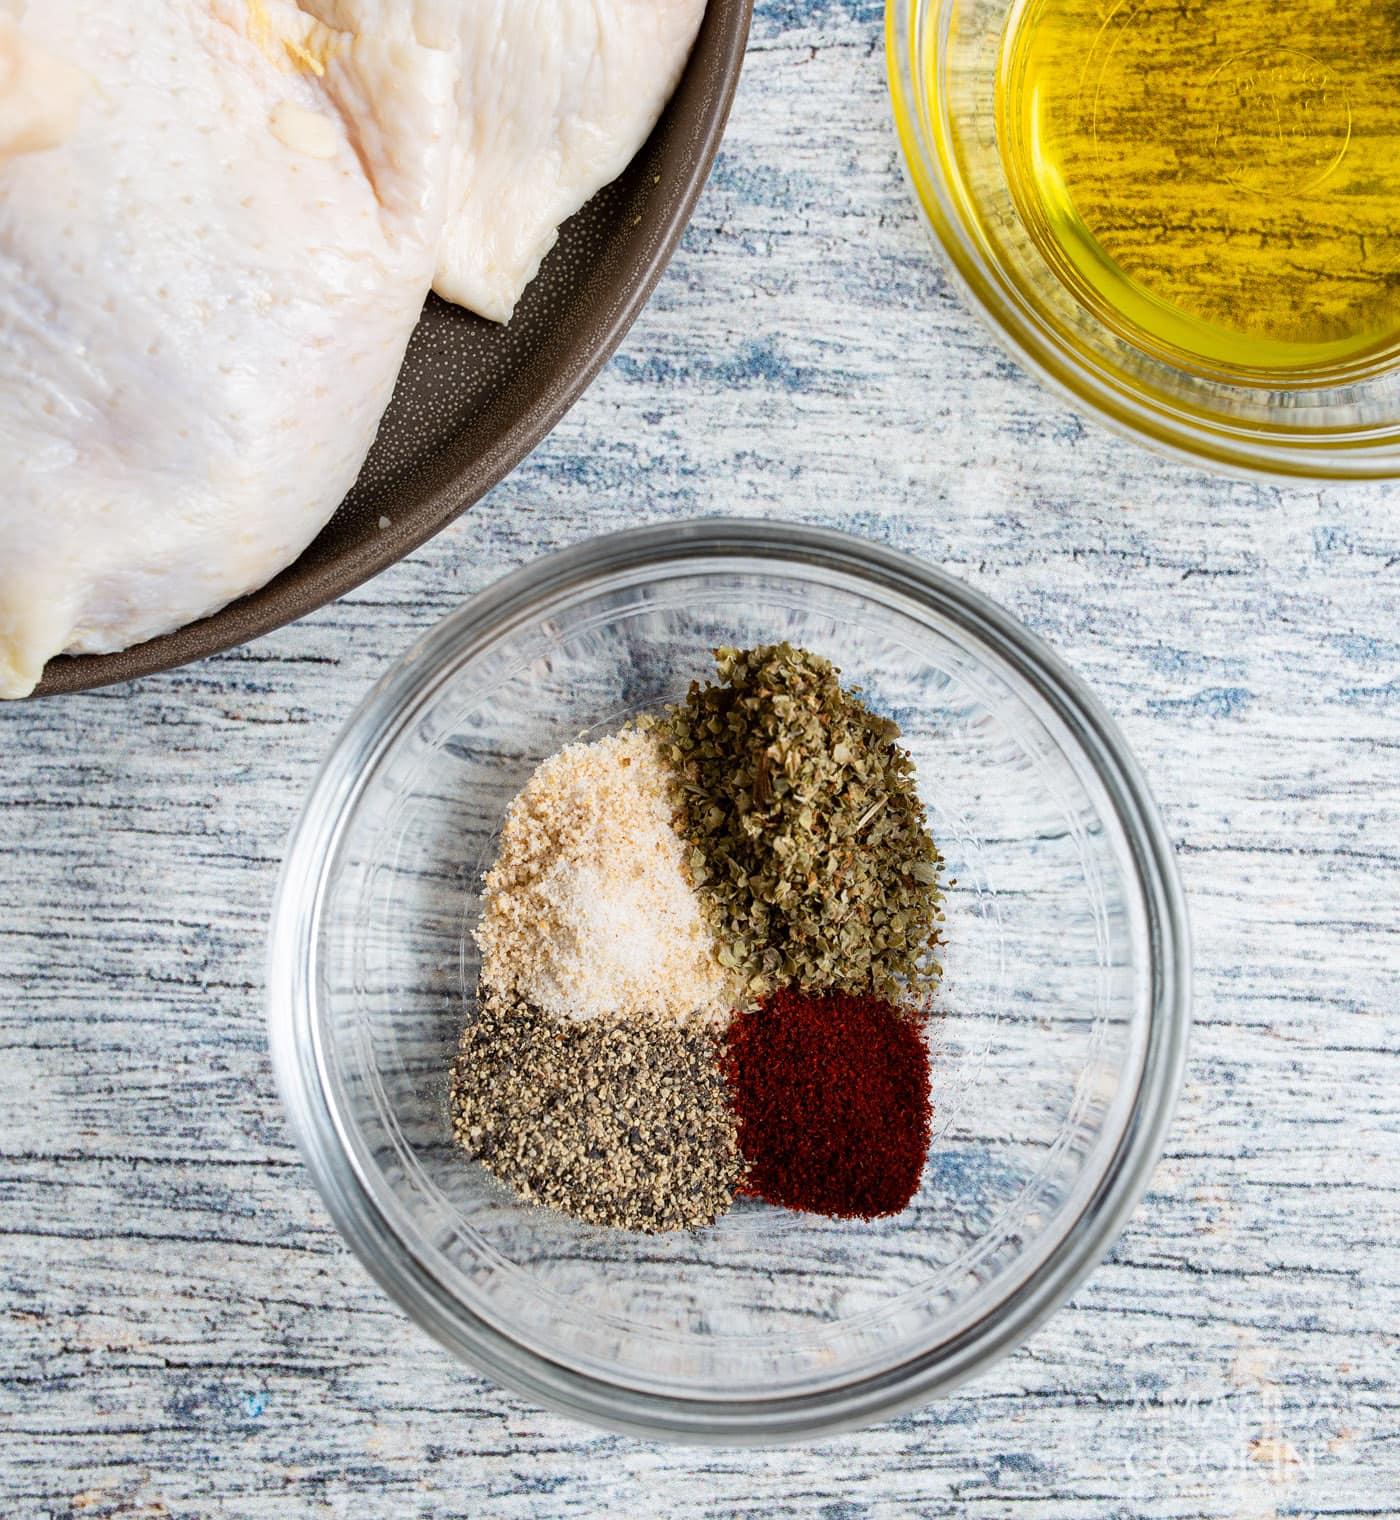 seasonings in a small bowl